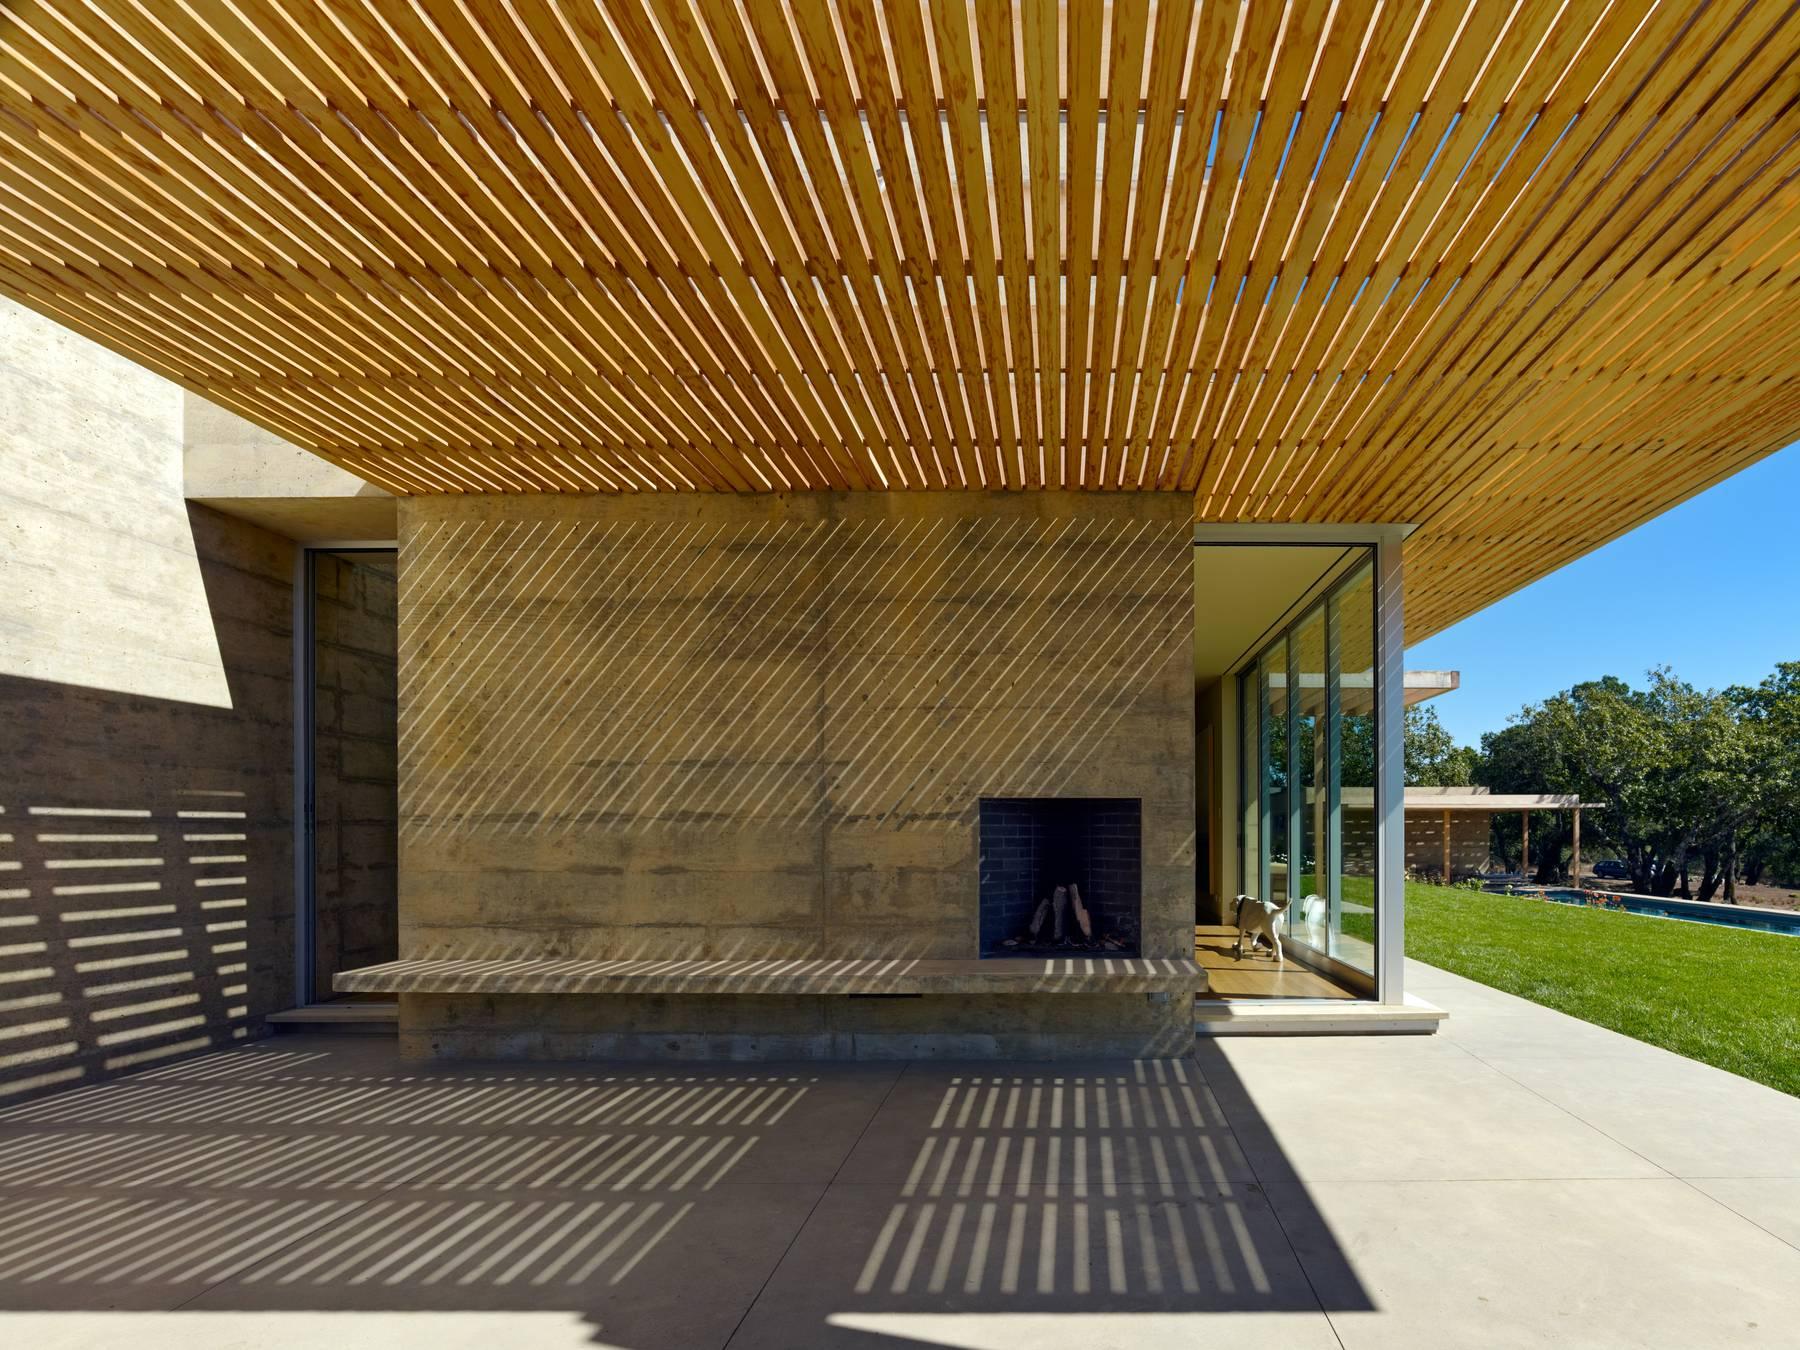 Sonoma Residence, Sonoma, California, 2010  Gluckman Mayner Architects:  Carol Chang, Snr Archt